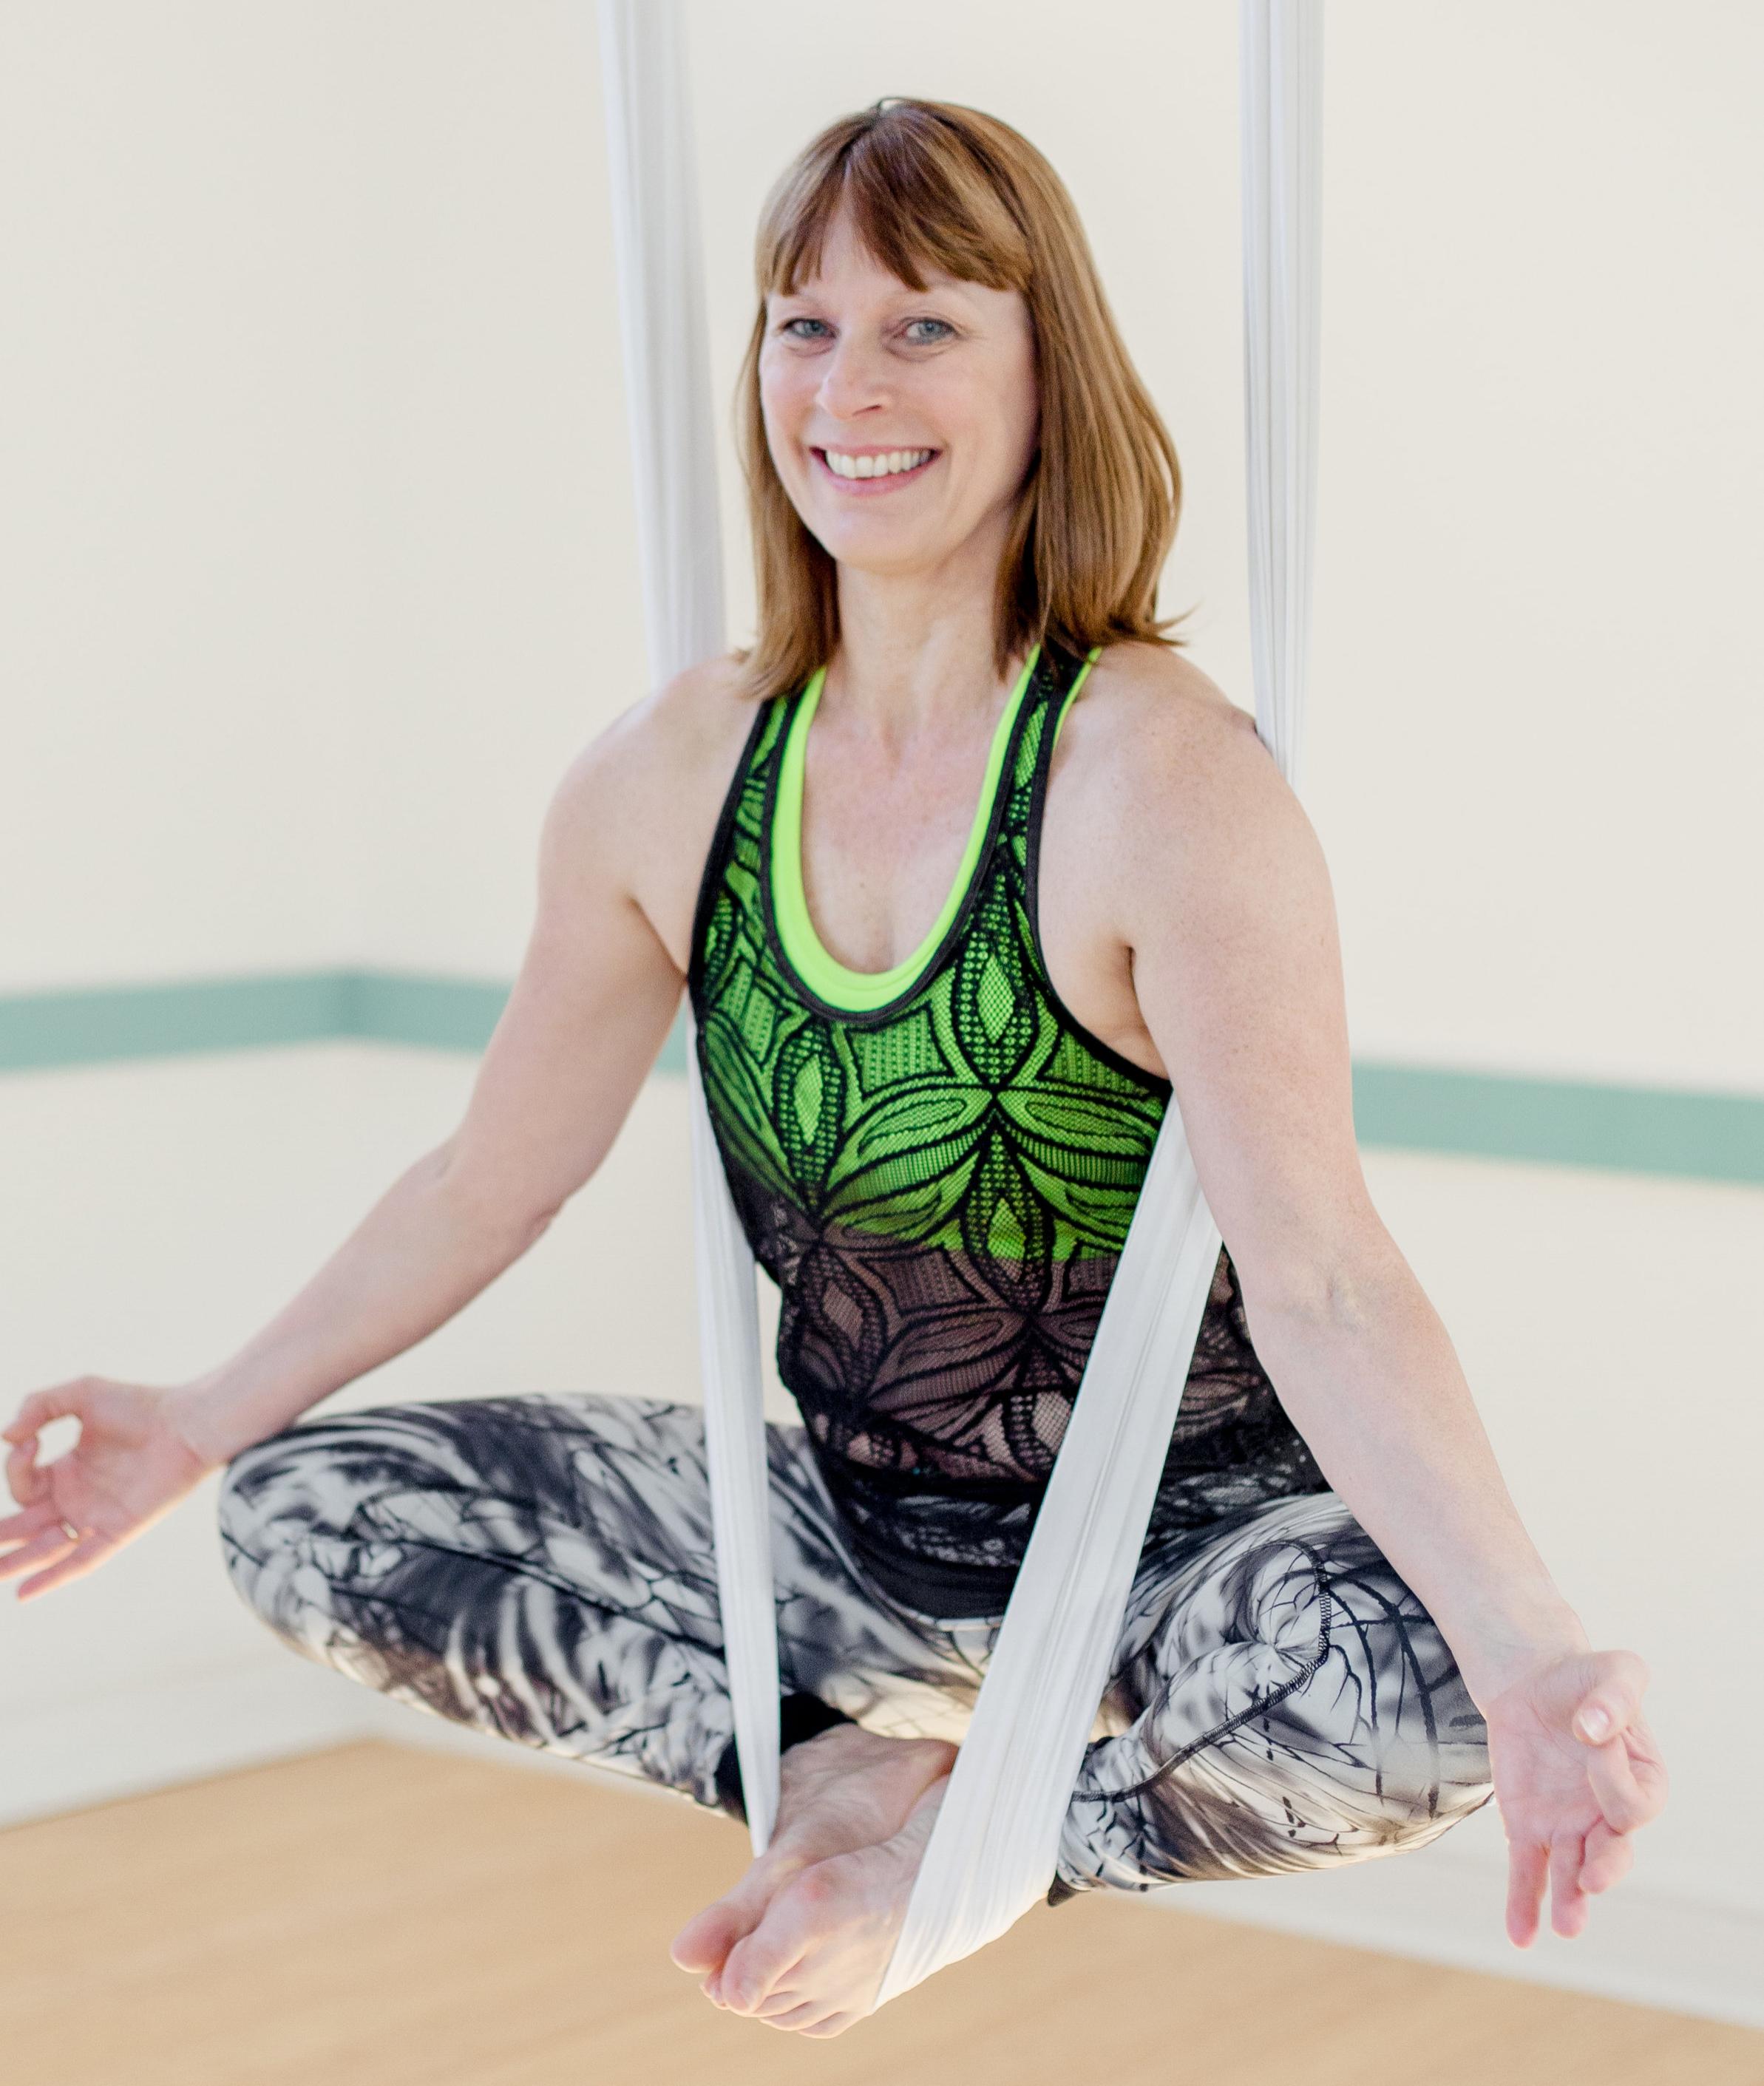 pauline yoga tring studio-68.jpg